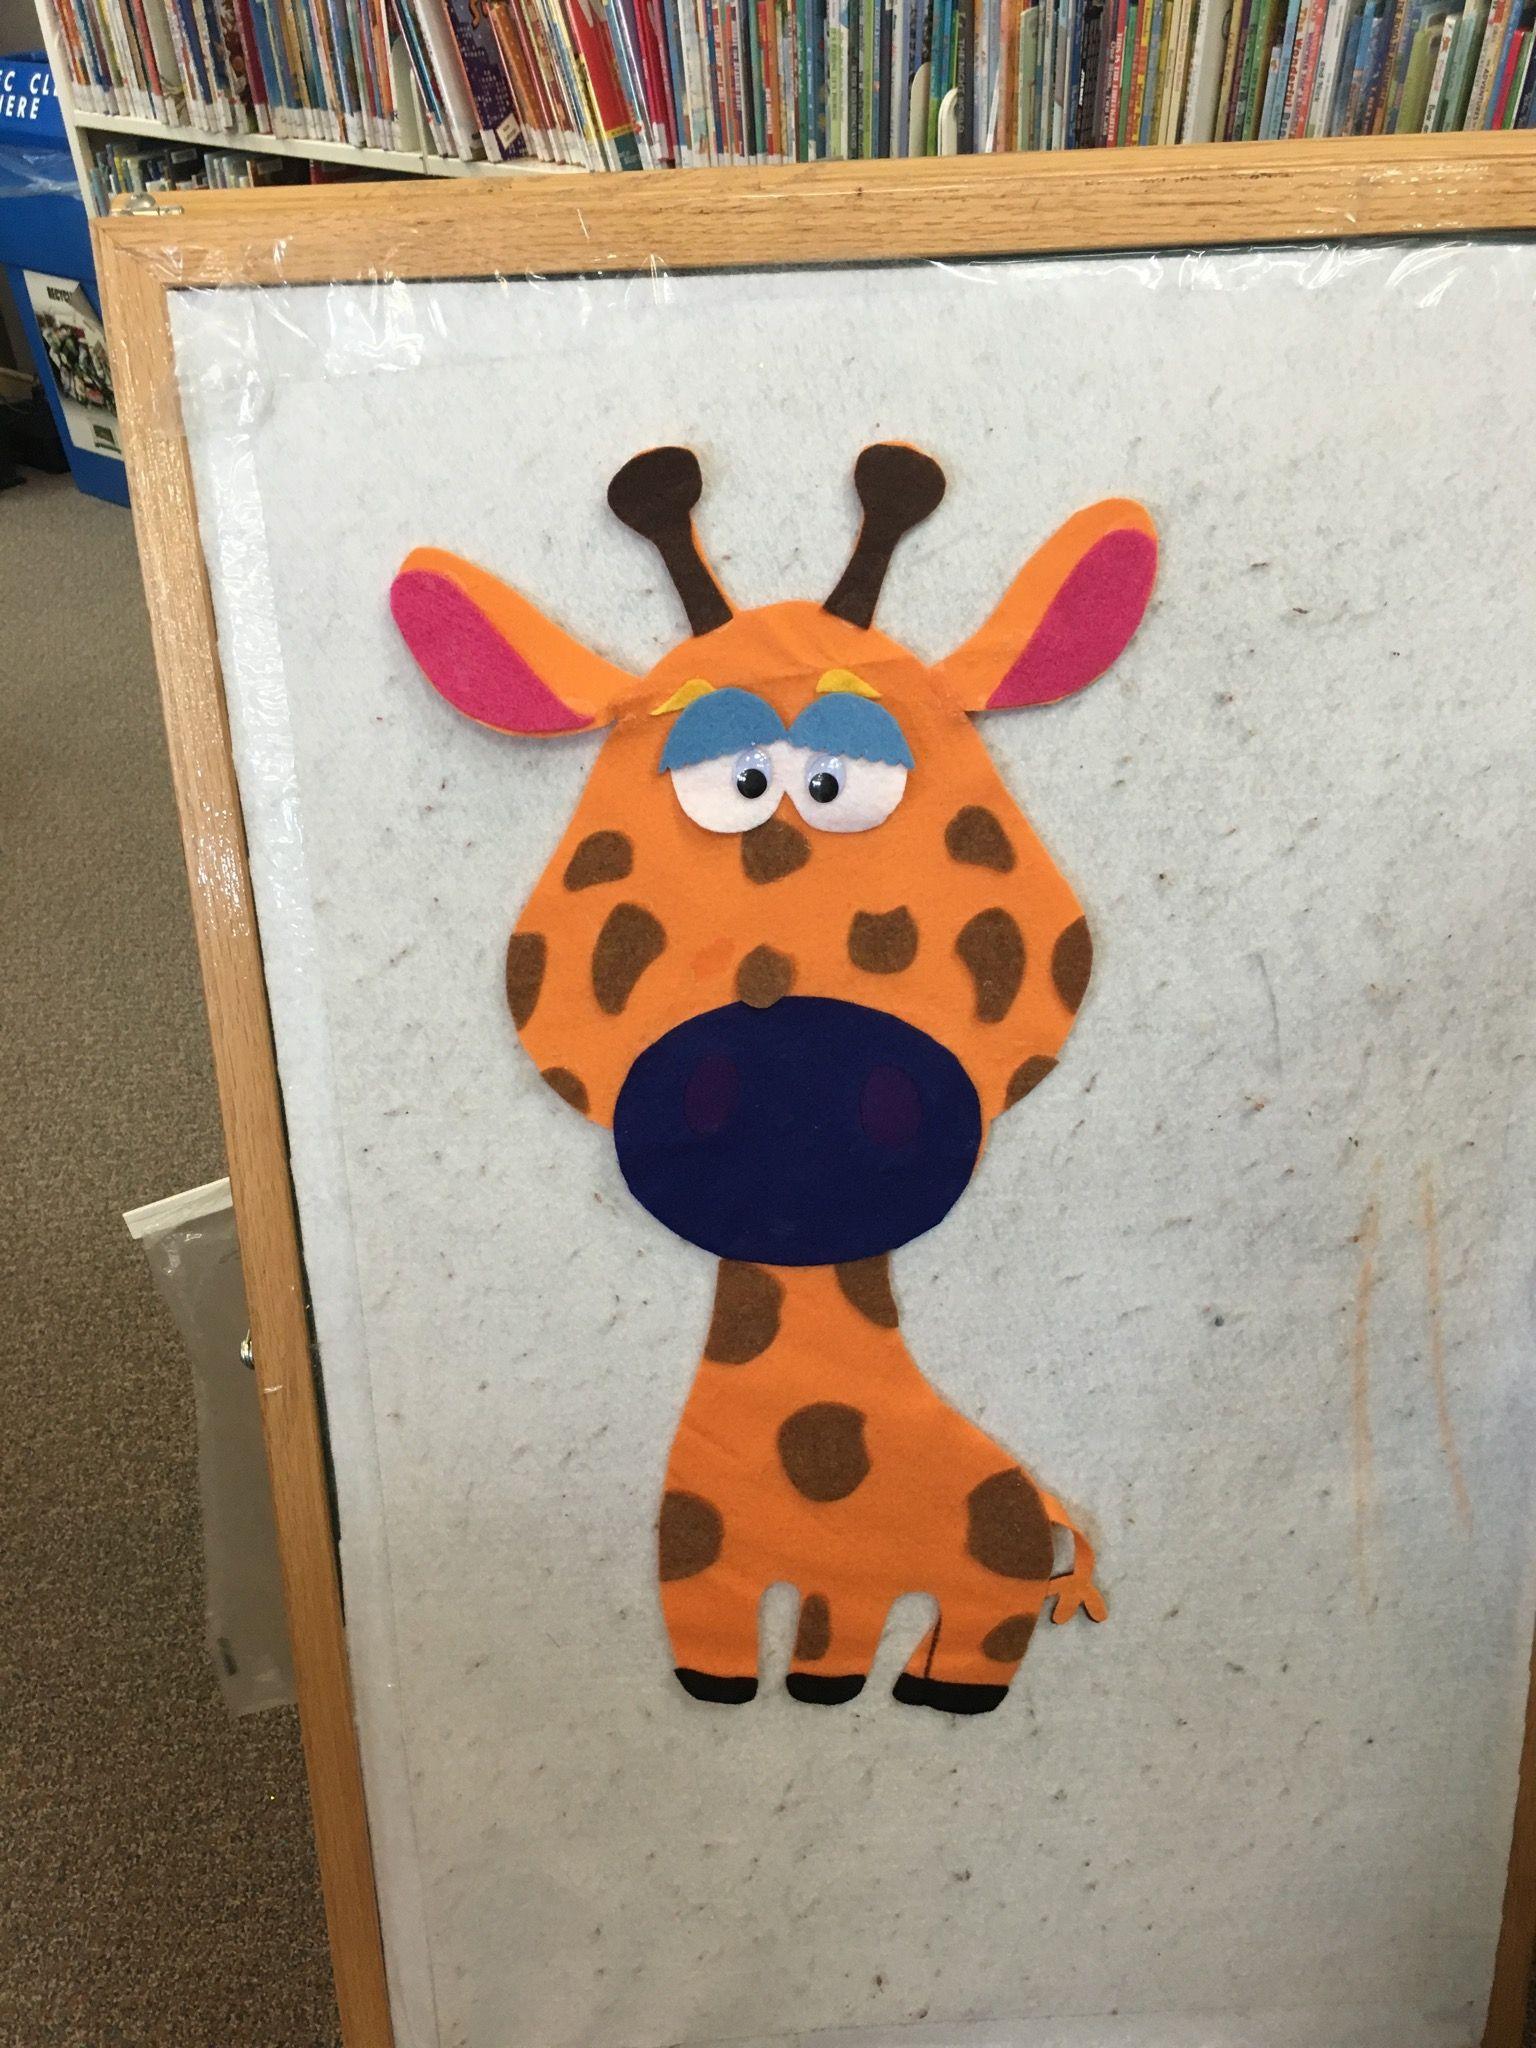 Felt board giraffe do it yourself library jungle display flannel felt board giraffe do it yourself library jungle display solutioingenieria Choice Image